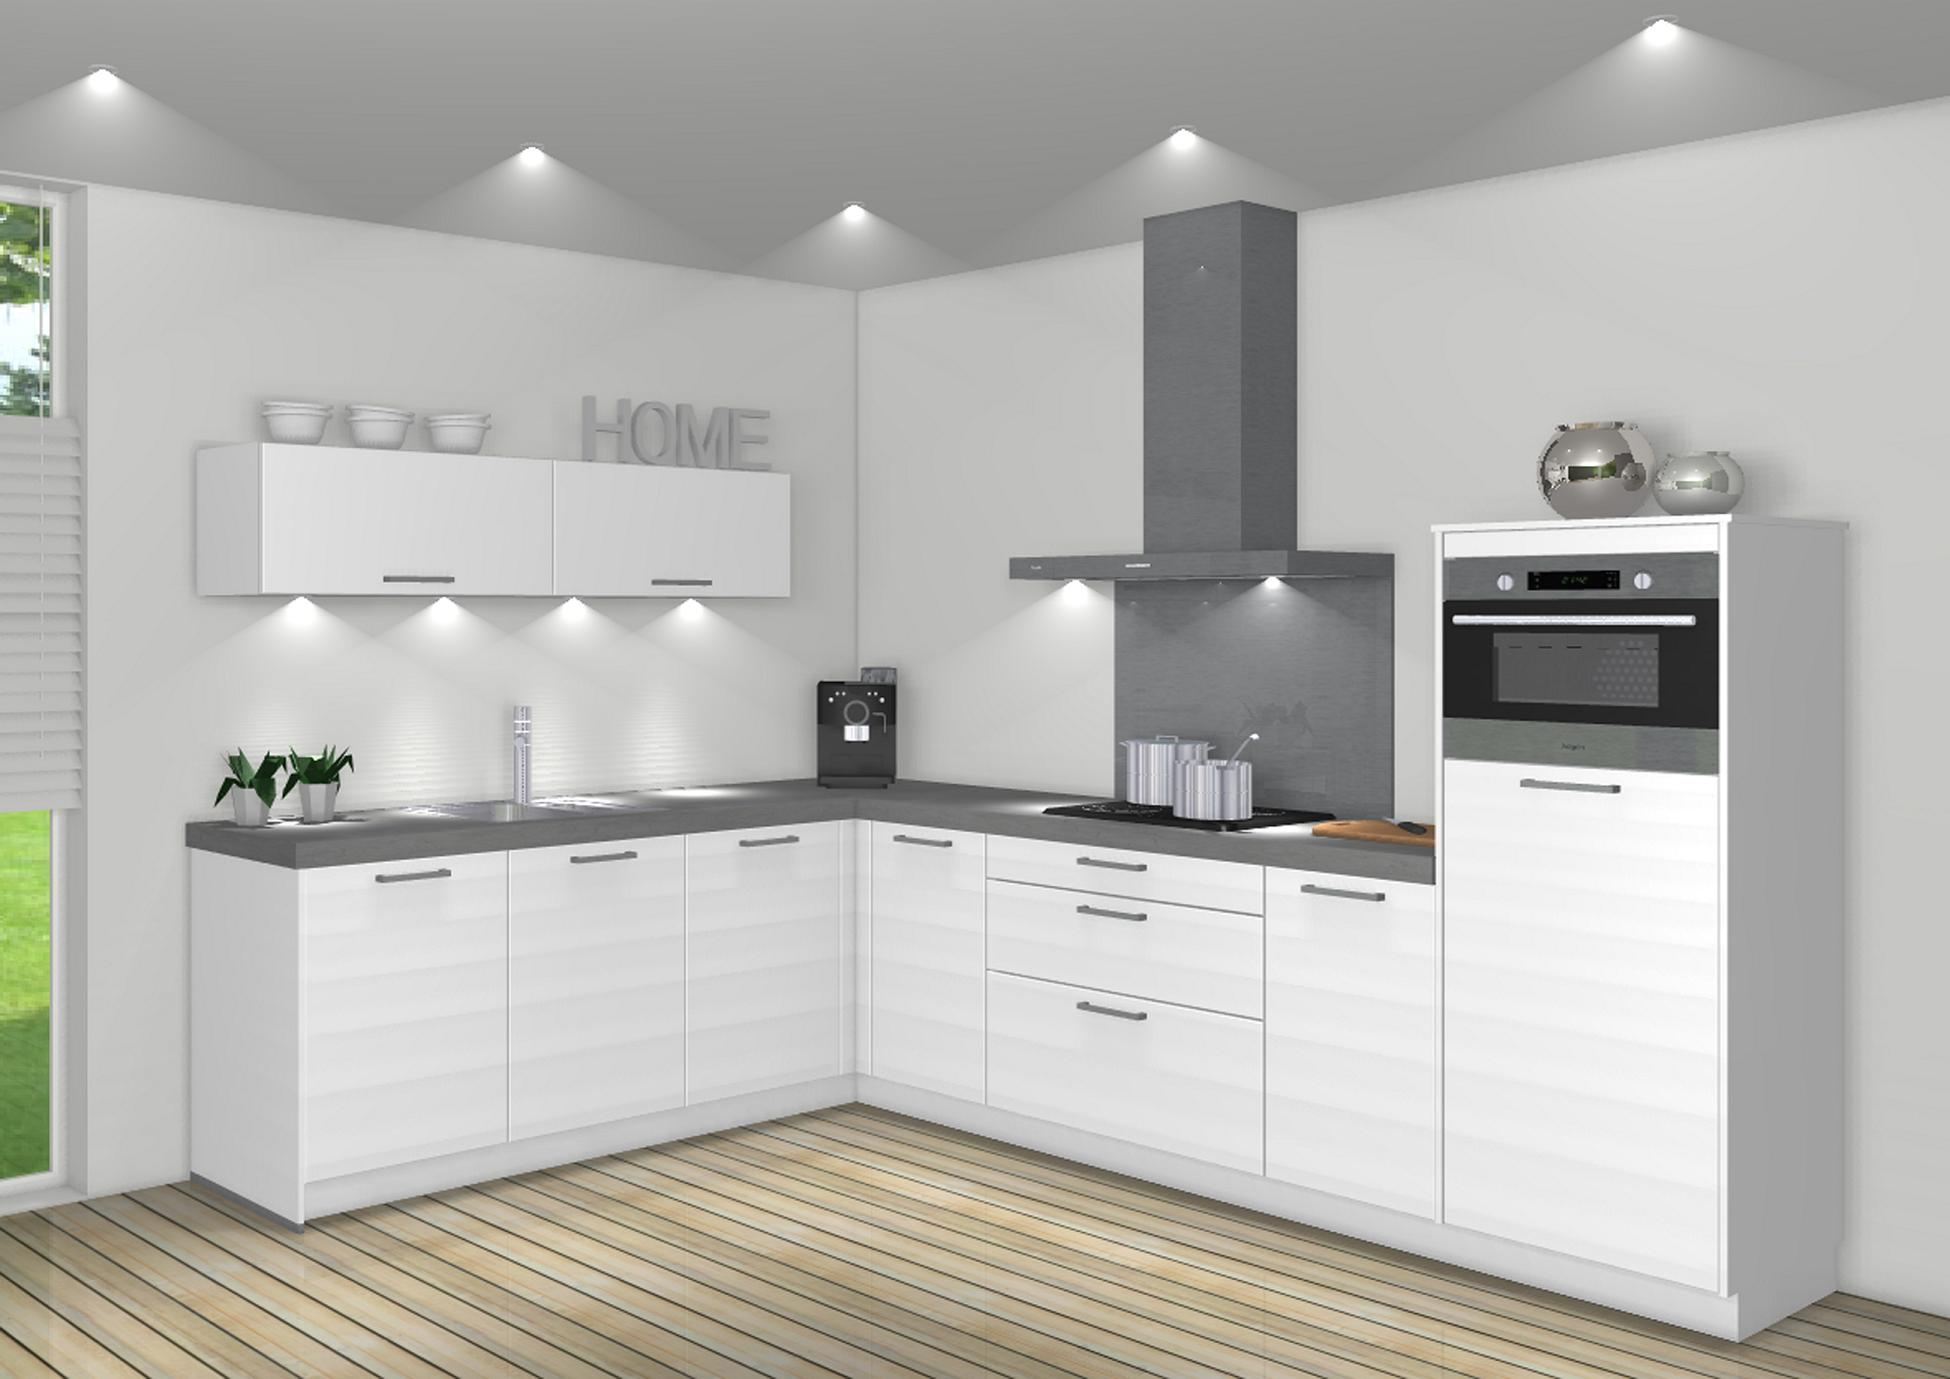 Hoekkeuken bkb keukens hoekkeuken massief hout - Eigentijdse design keuken ...